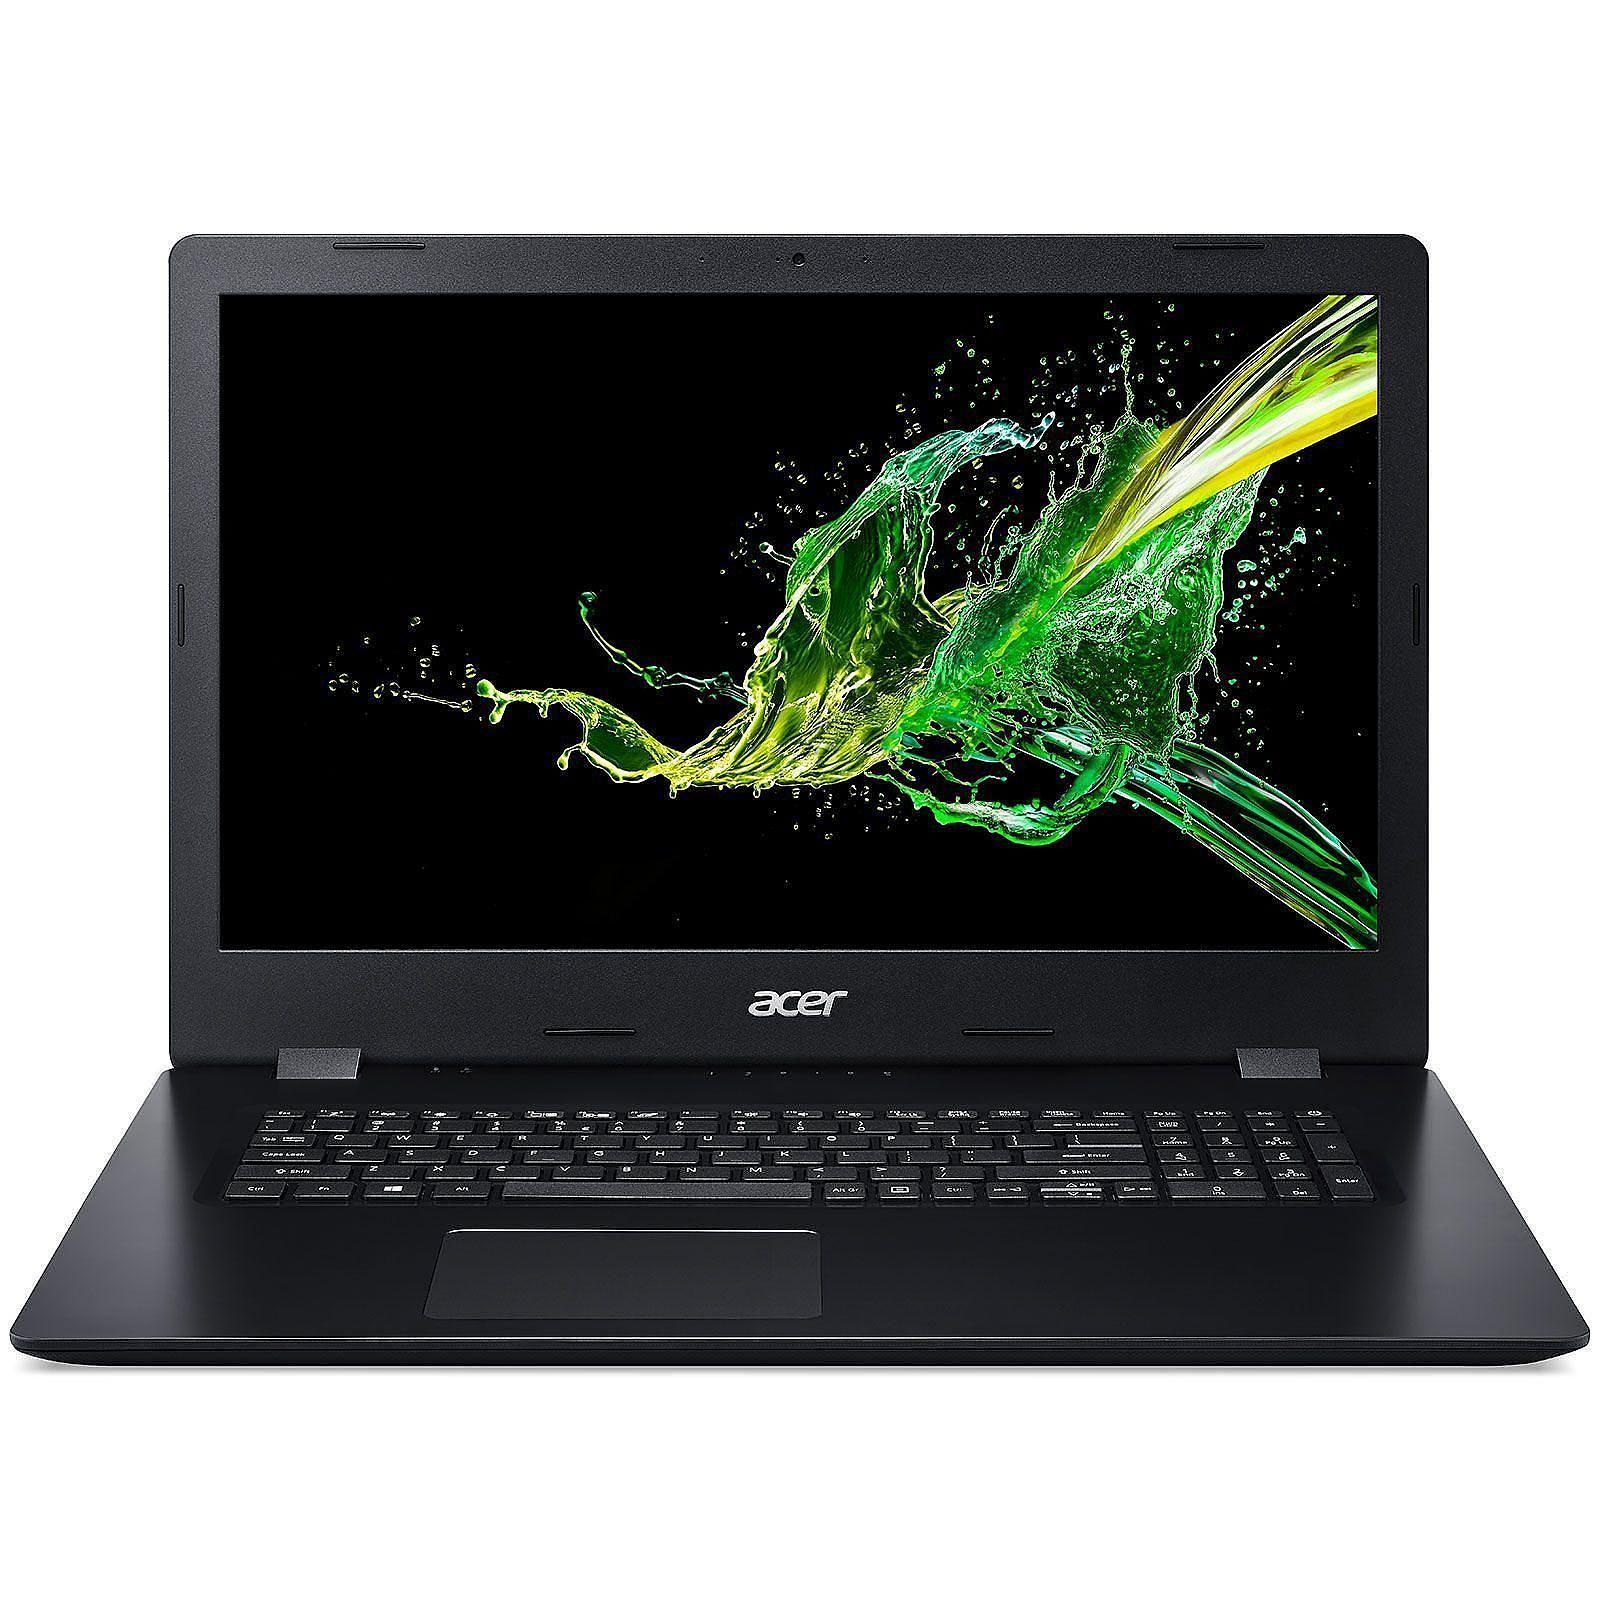 Acer NX.HZWEF.008 - PC portable Acer - Cybertek.fr - 3